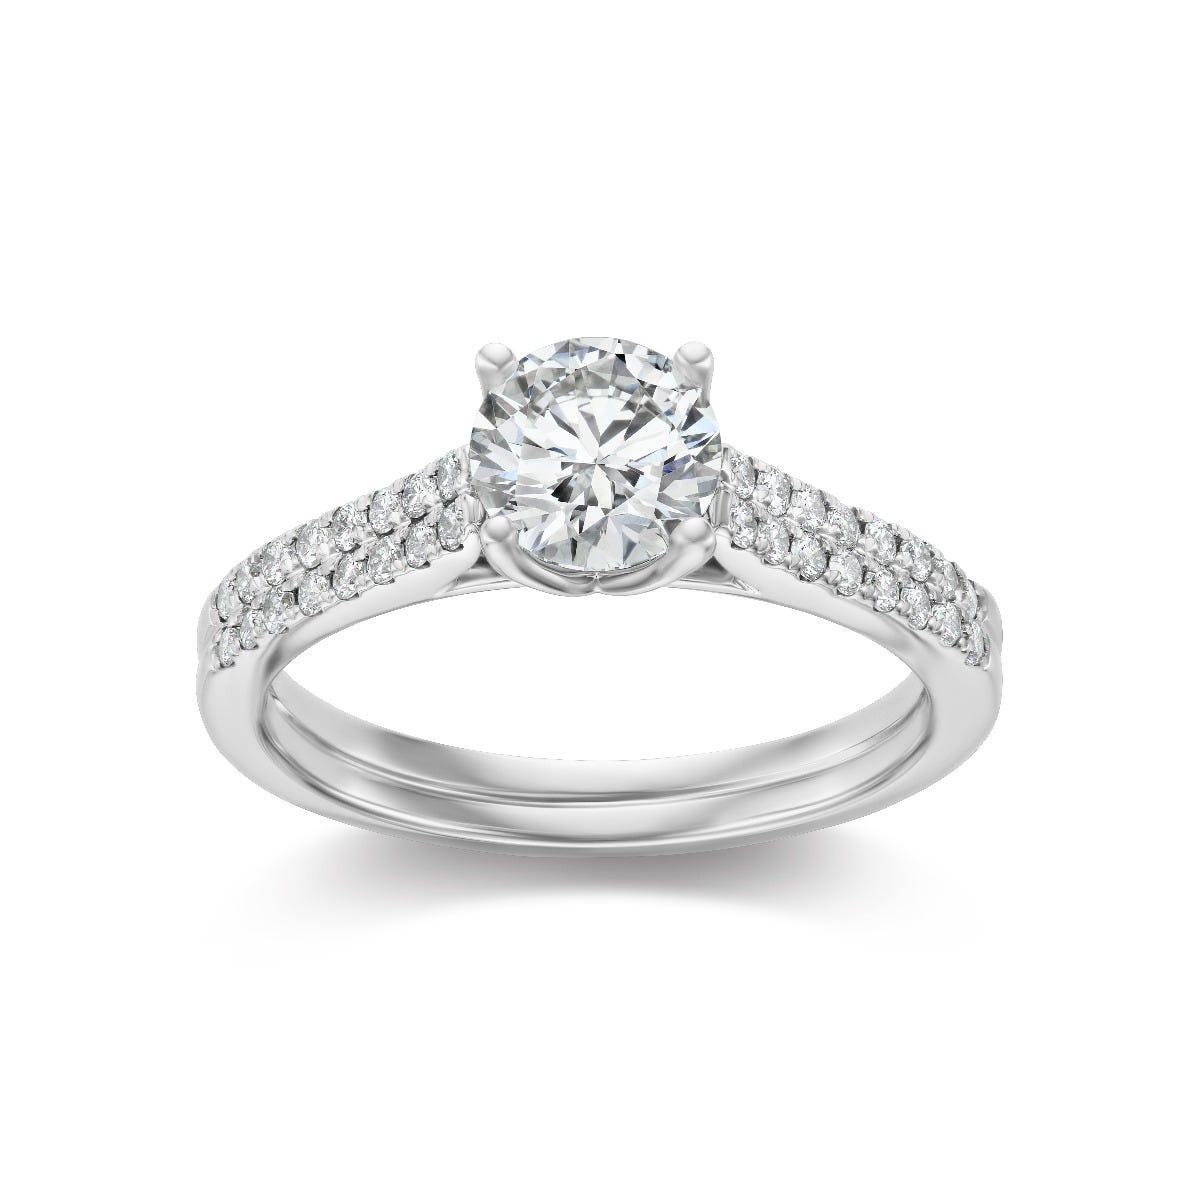 Lab Grown 1 1/4ctw. Diamond Engagement Ring in 14k White Gold